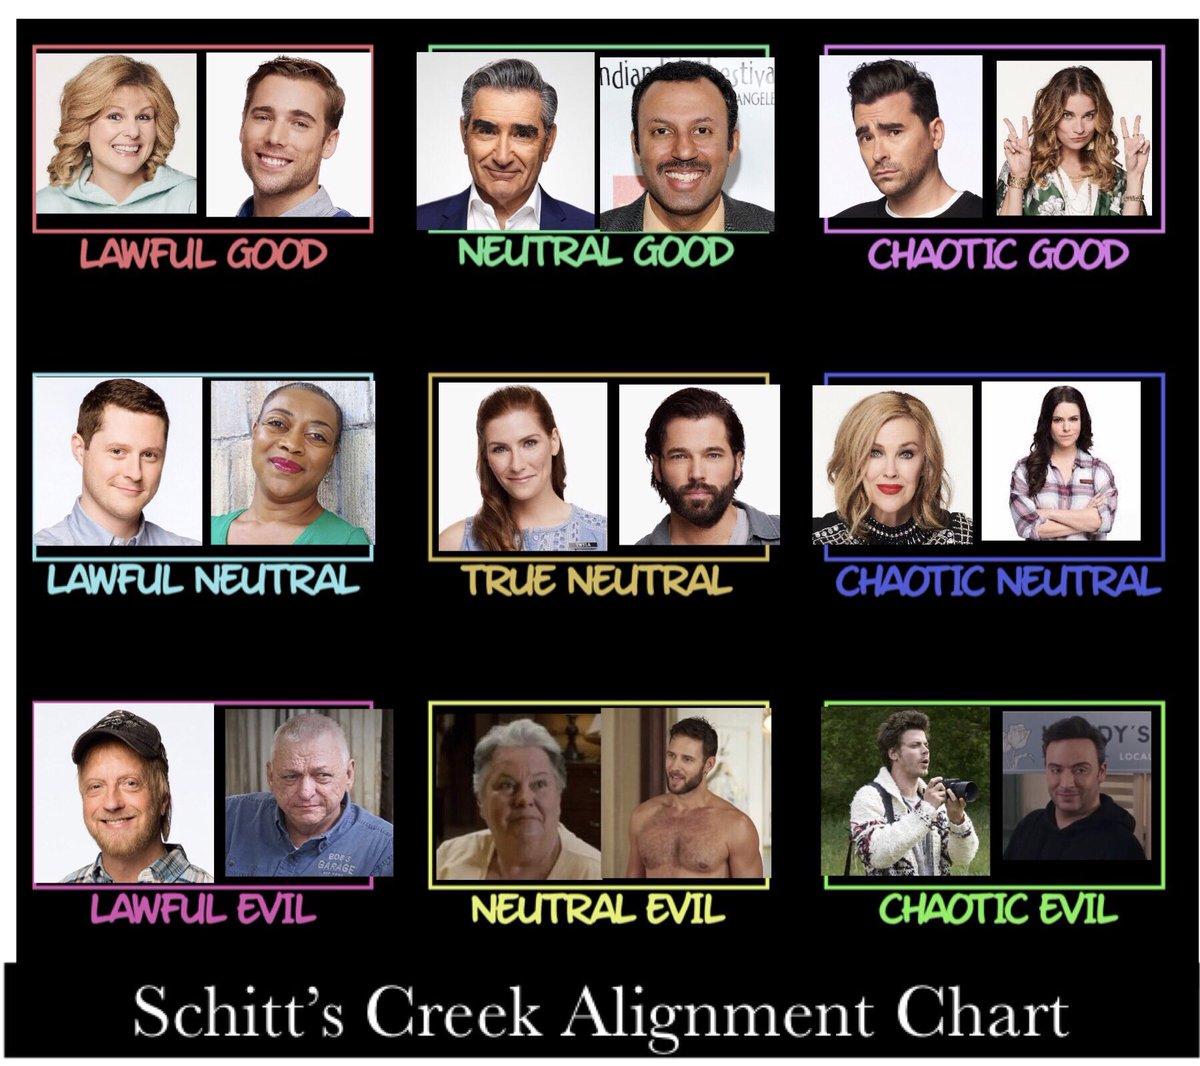 "Dogs of Schitts Creek on Twitter: ""Fixed it. #SchittsCreek #alignmentchart # alignment @danjlevy @SalvaTonio… """